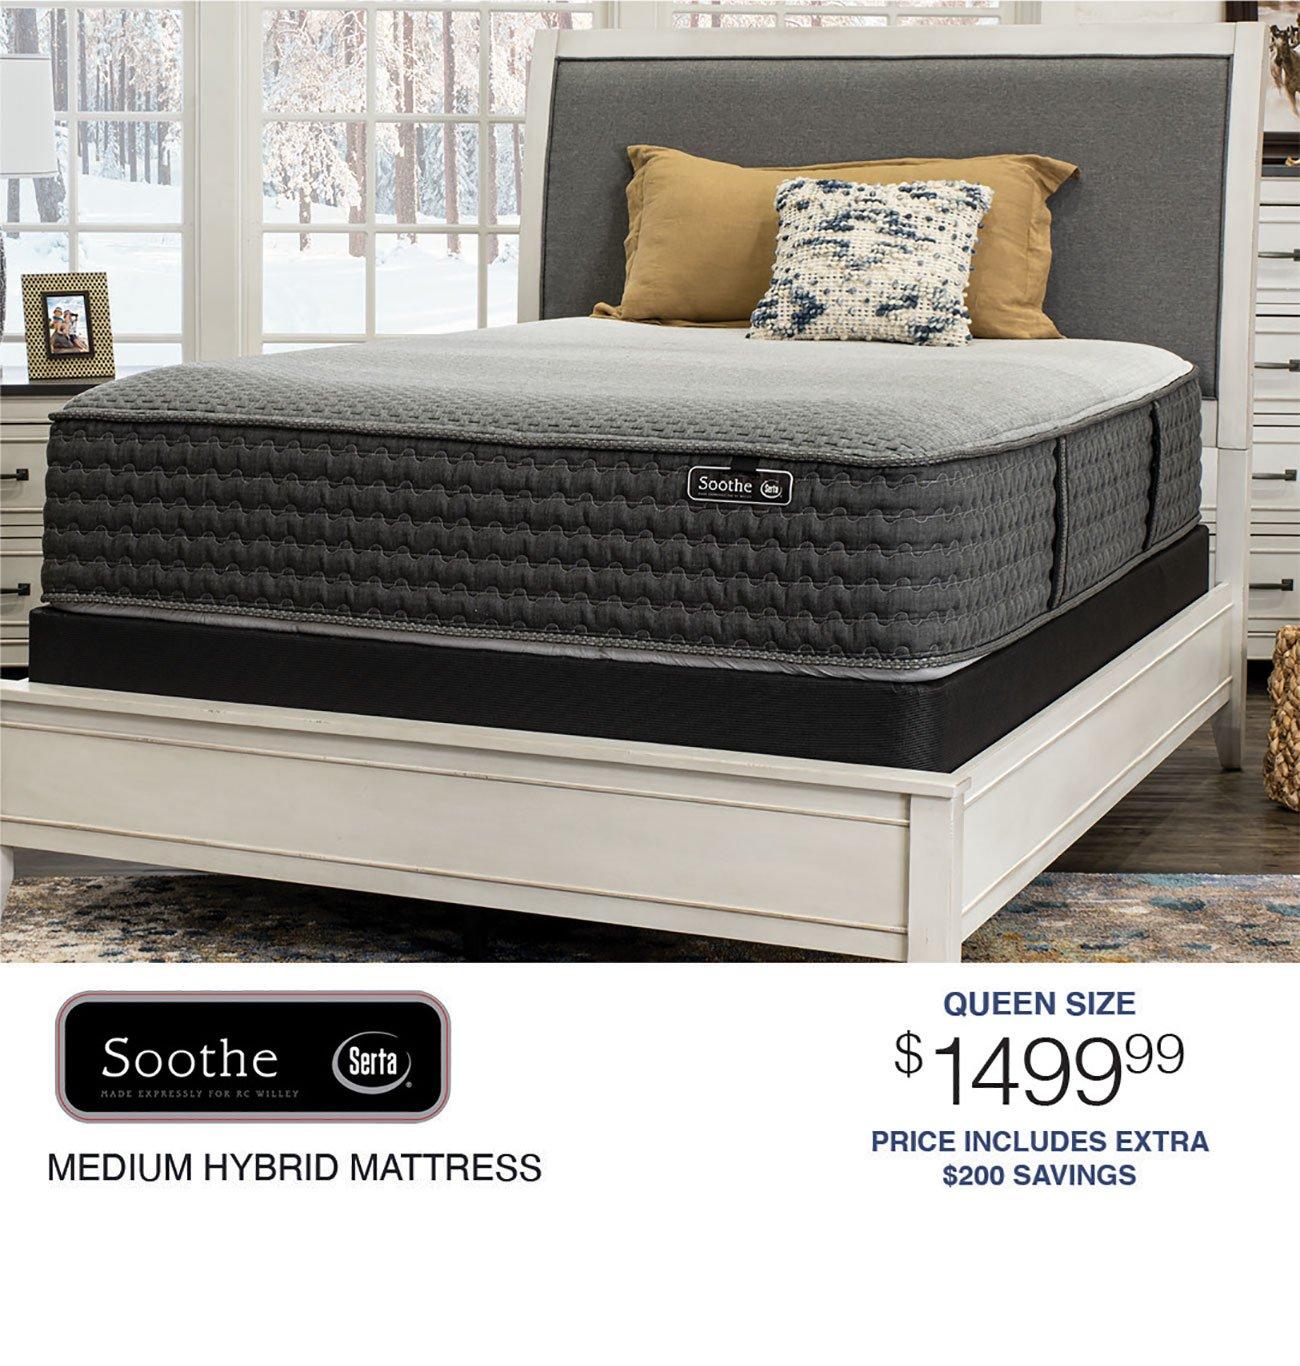 Serta-Soothe-Medium-Hybrid-Mattress